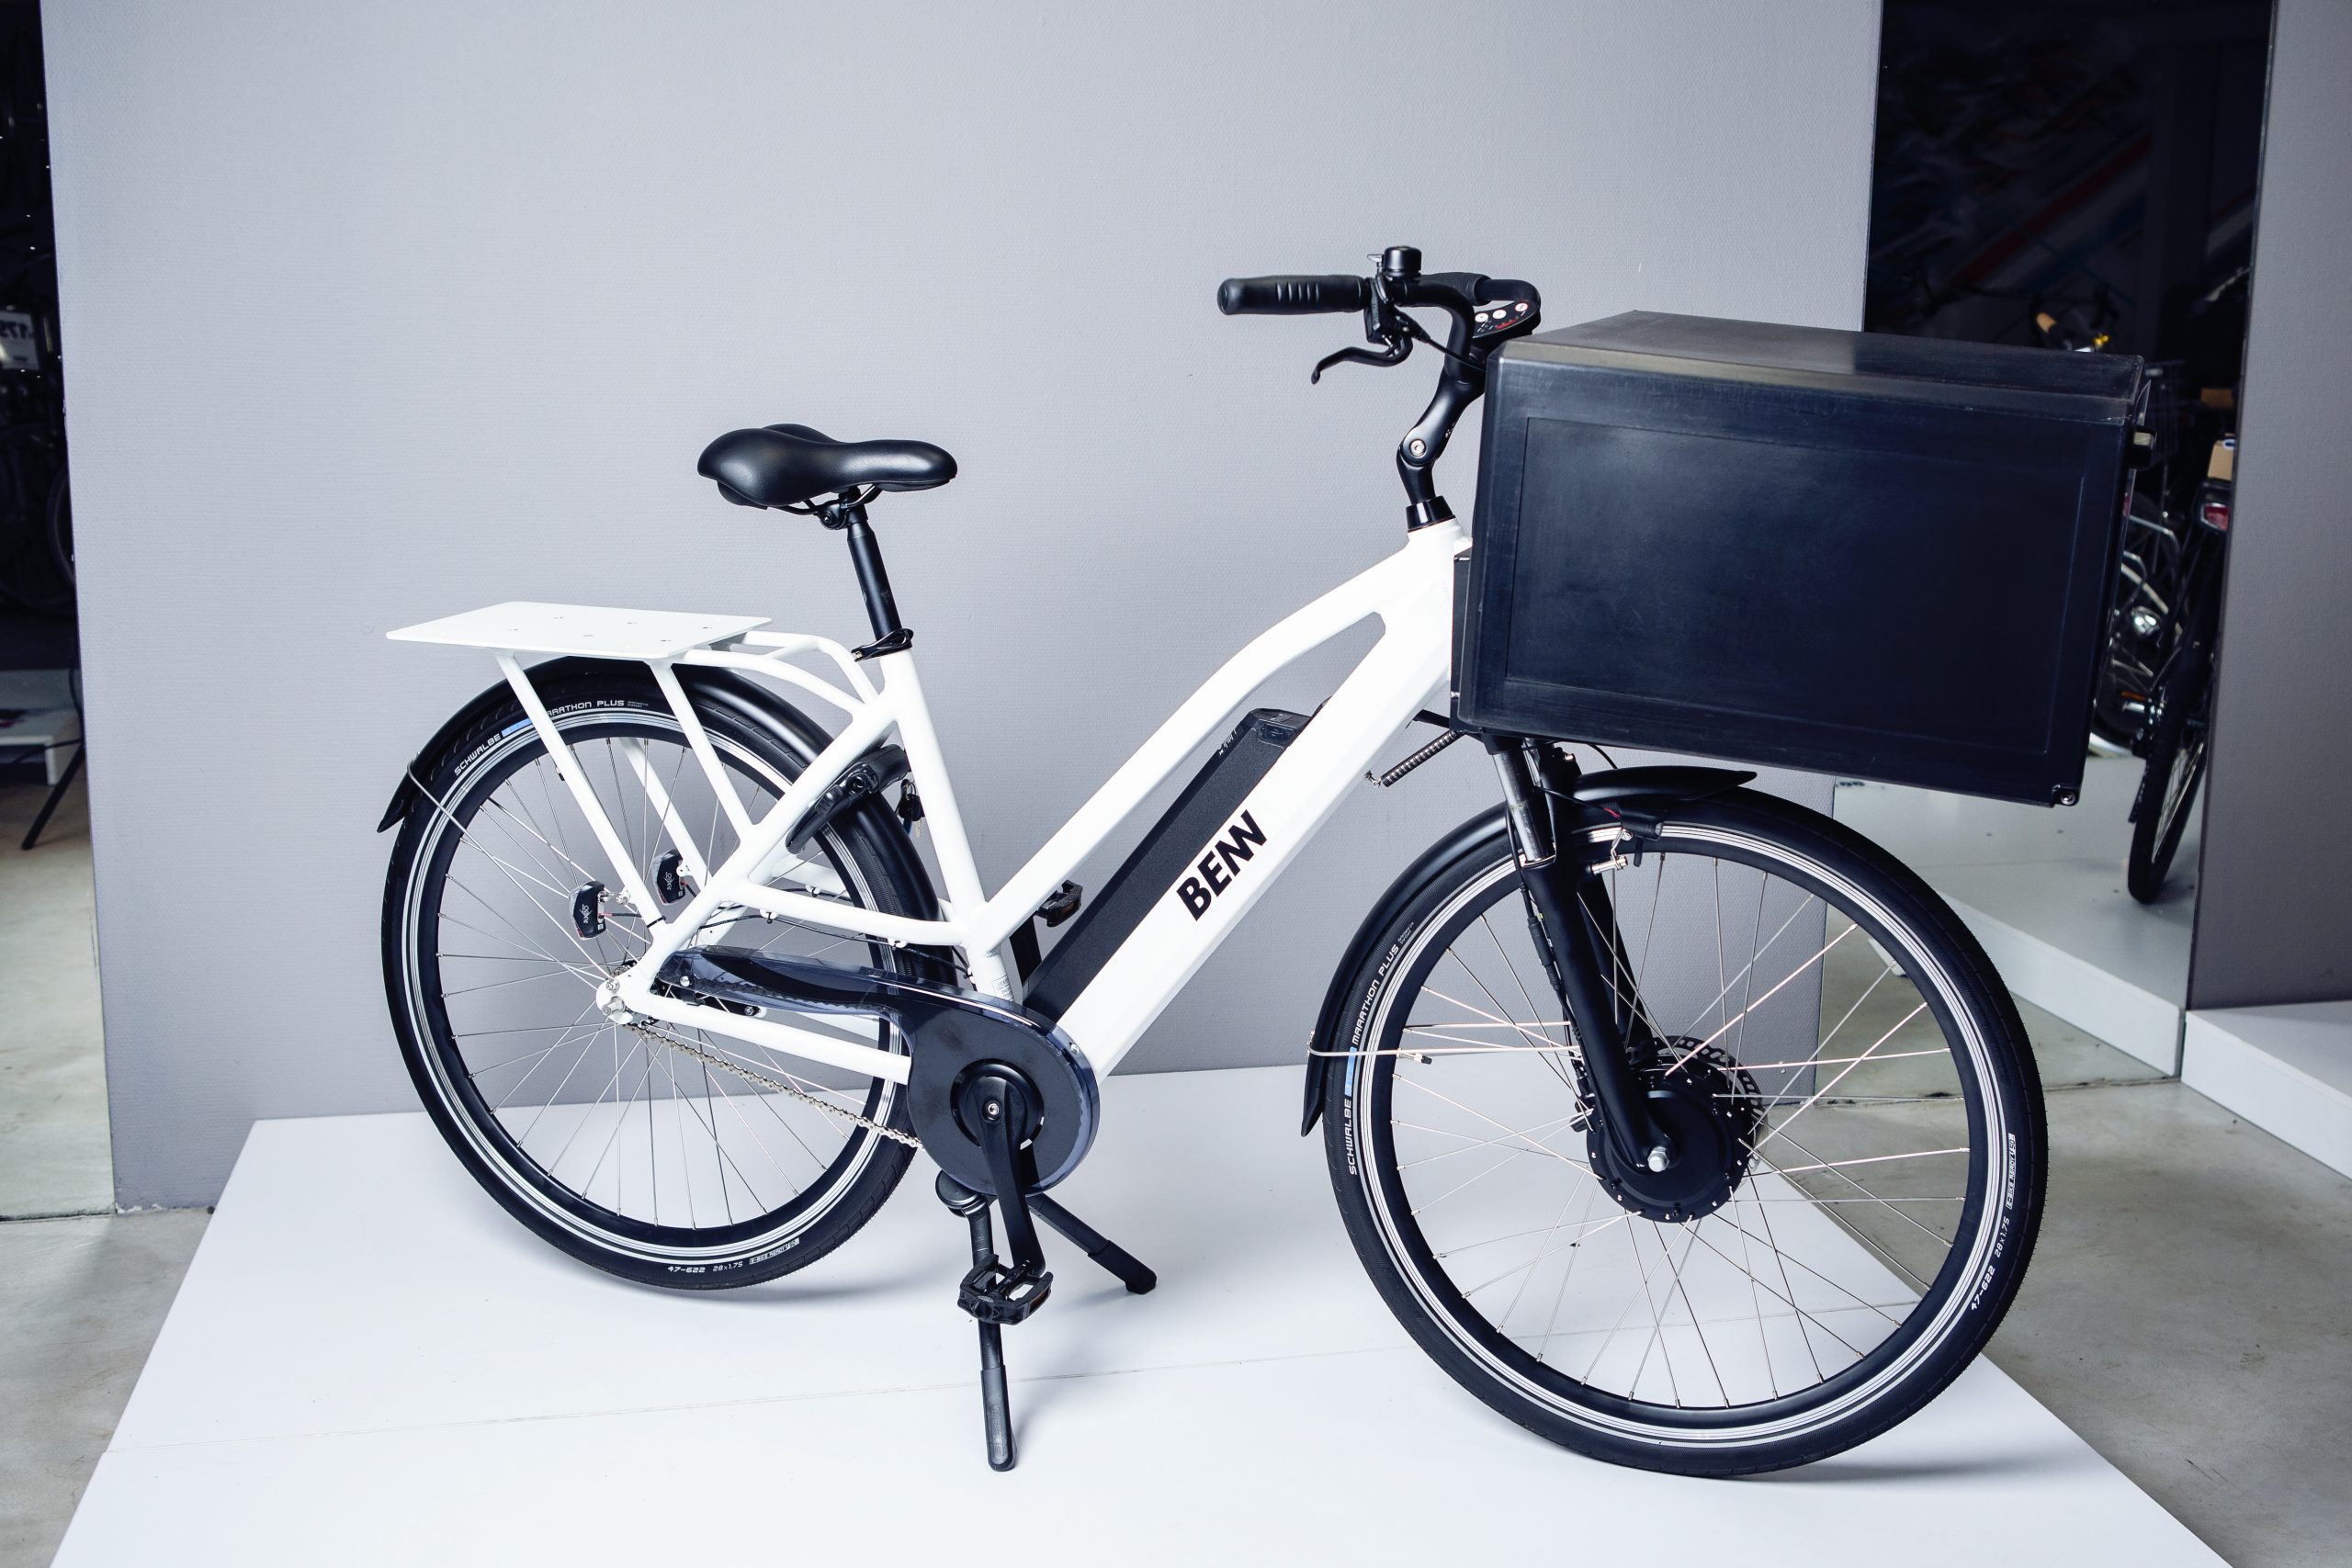 Bezorg fiets Leeuwarden